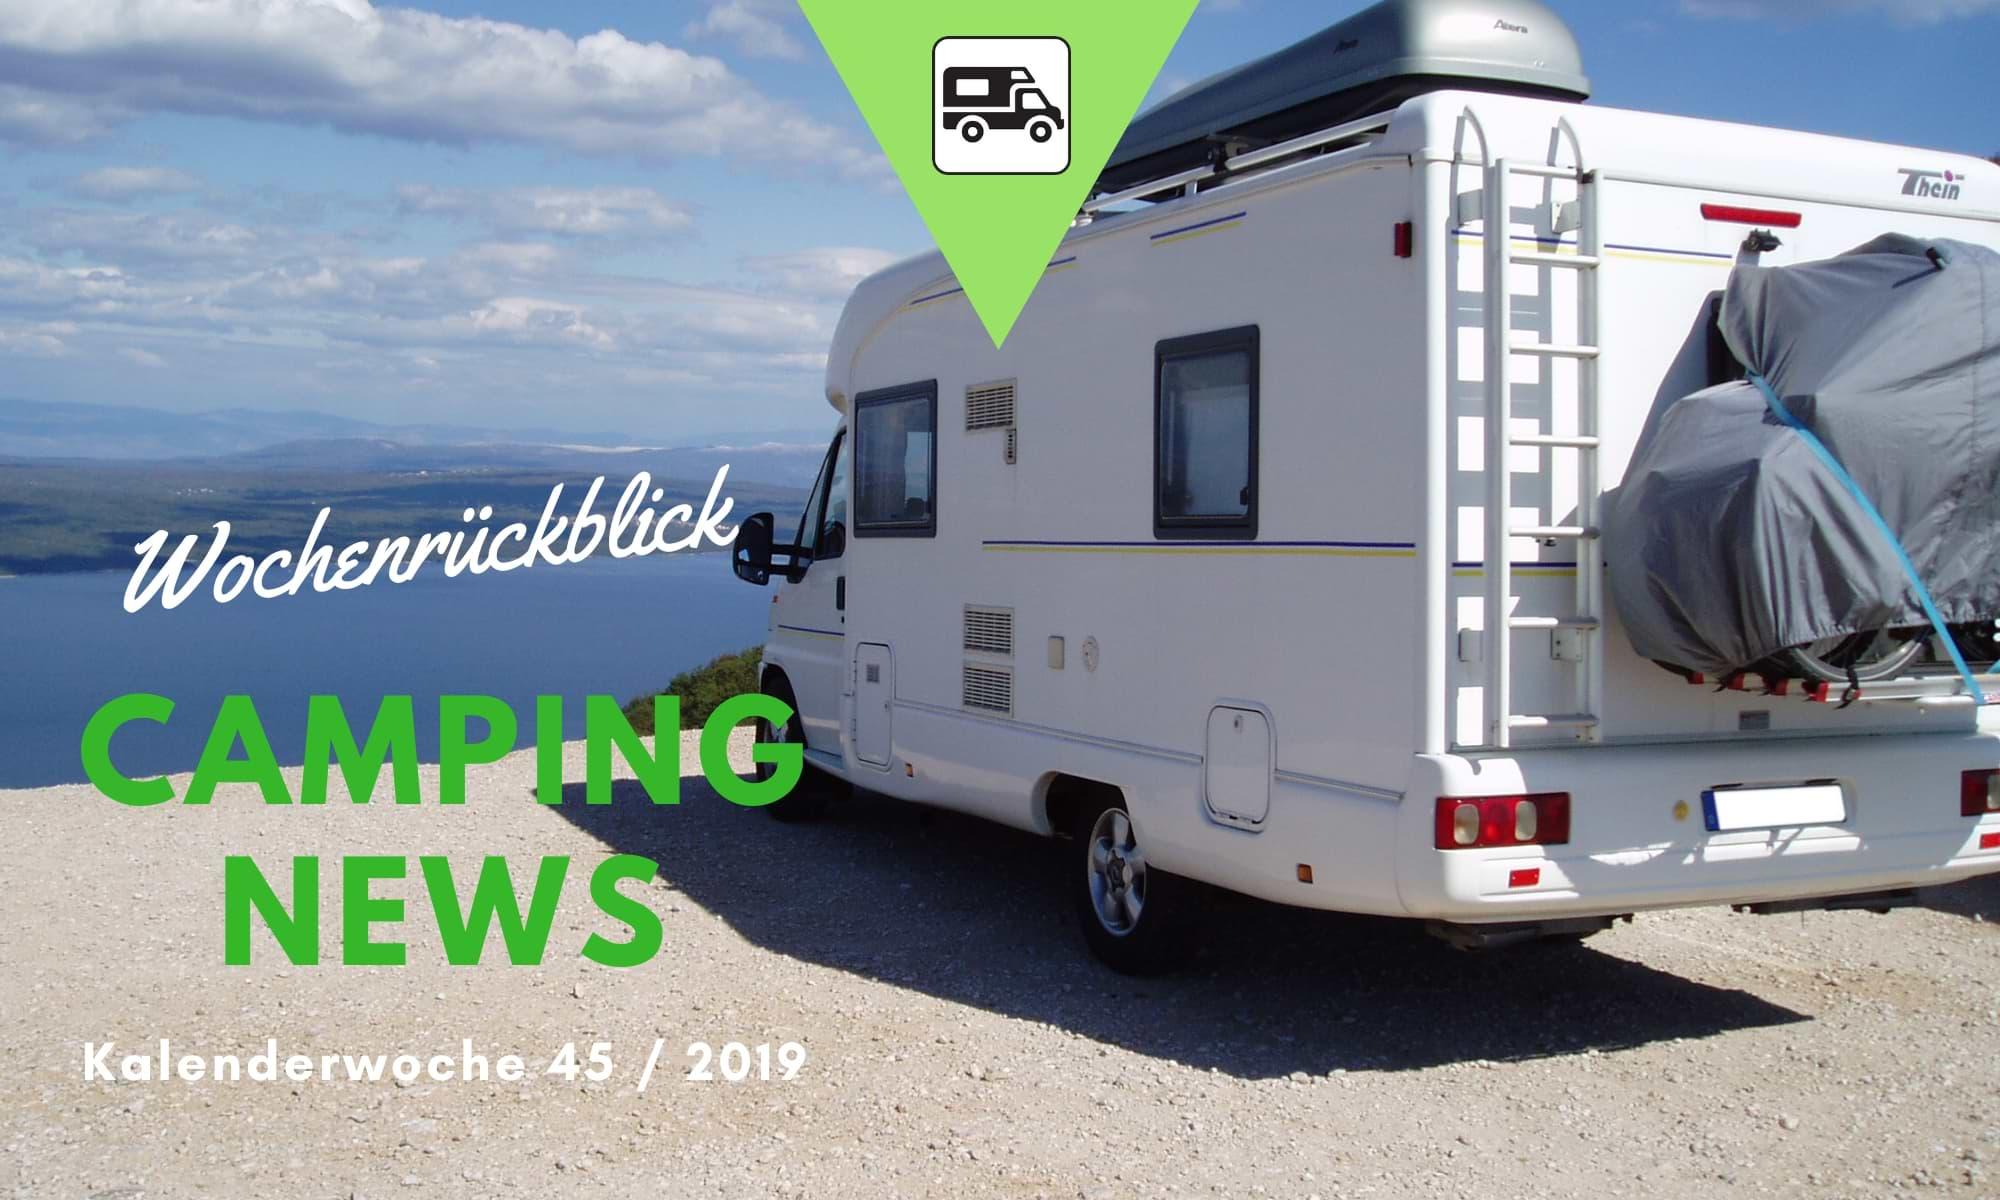 Camping News Wochenrückblick – KW45/2019